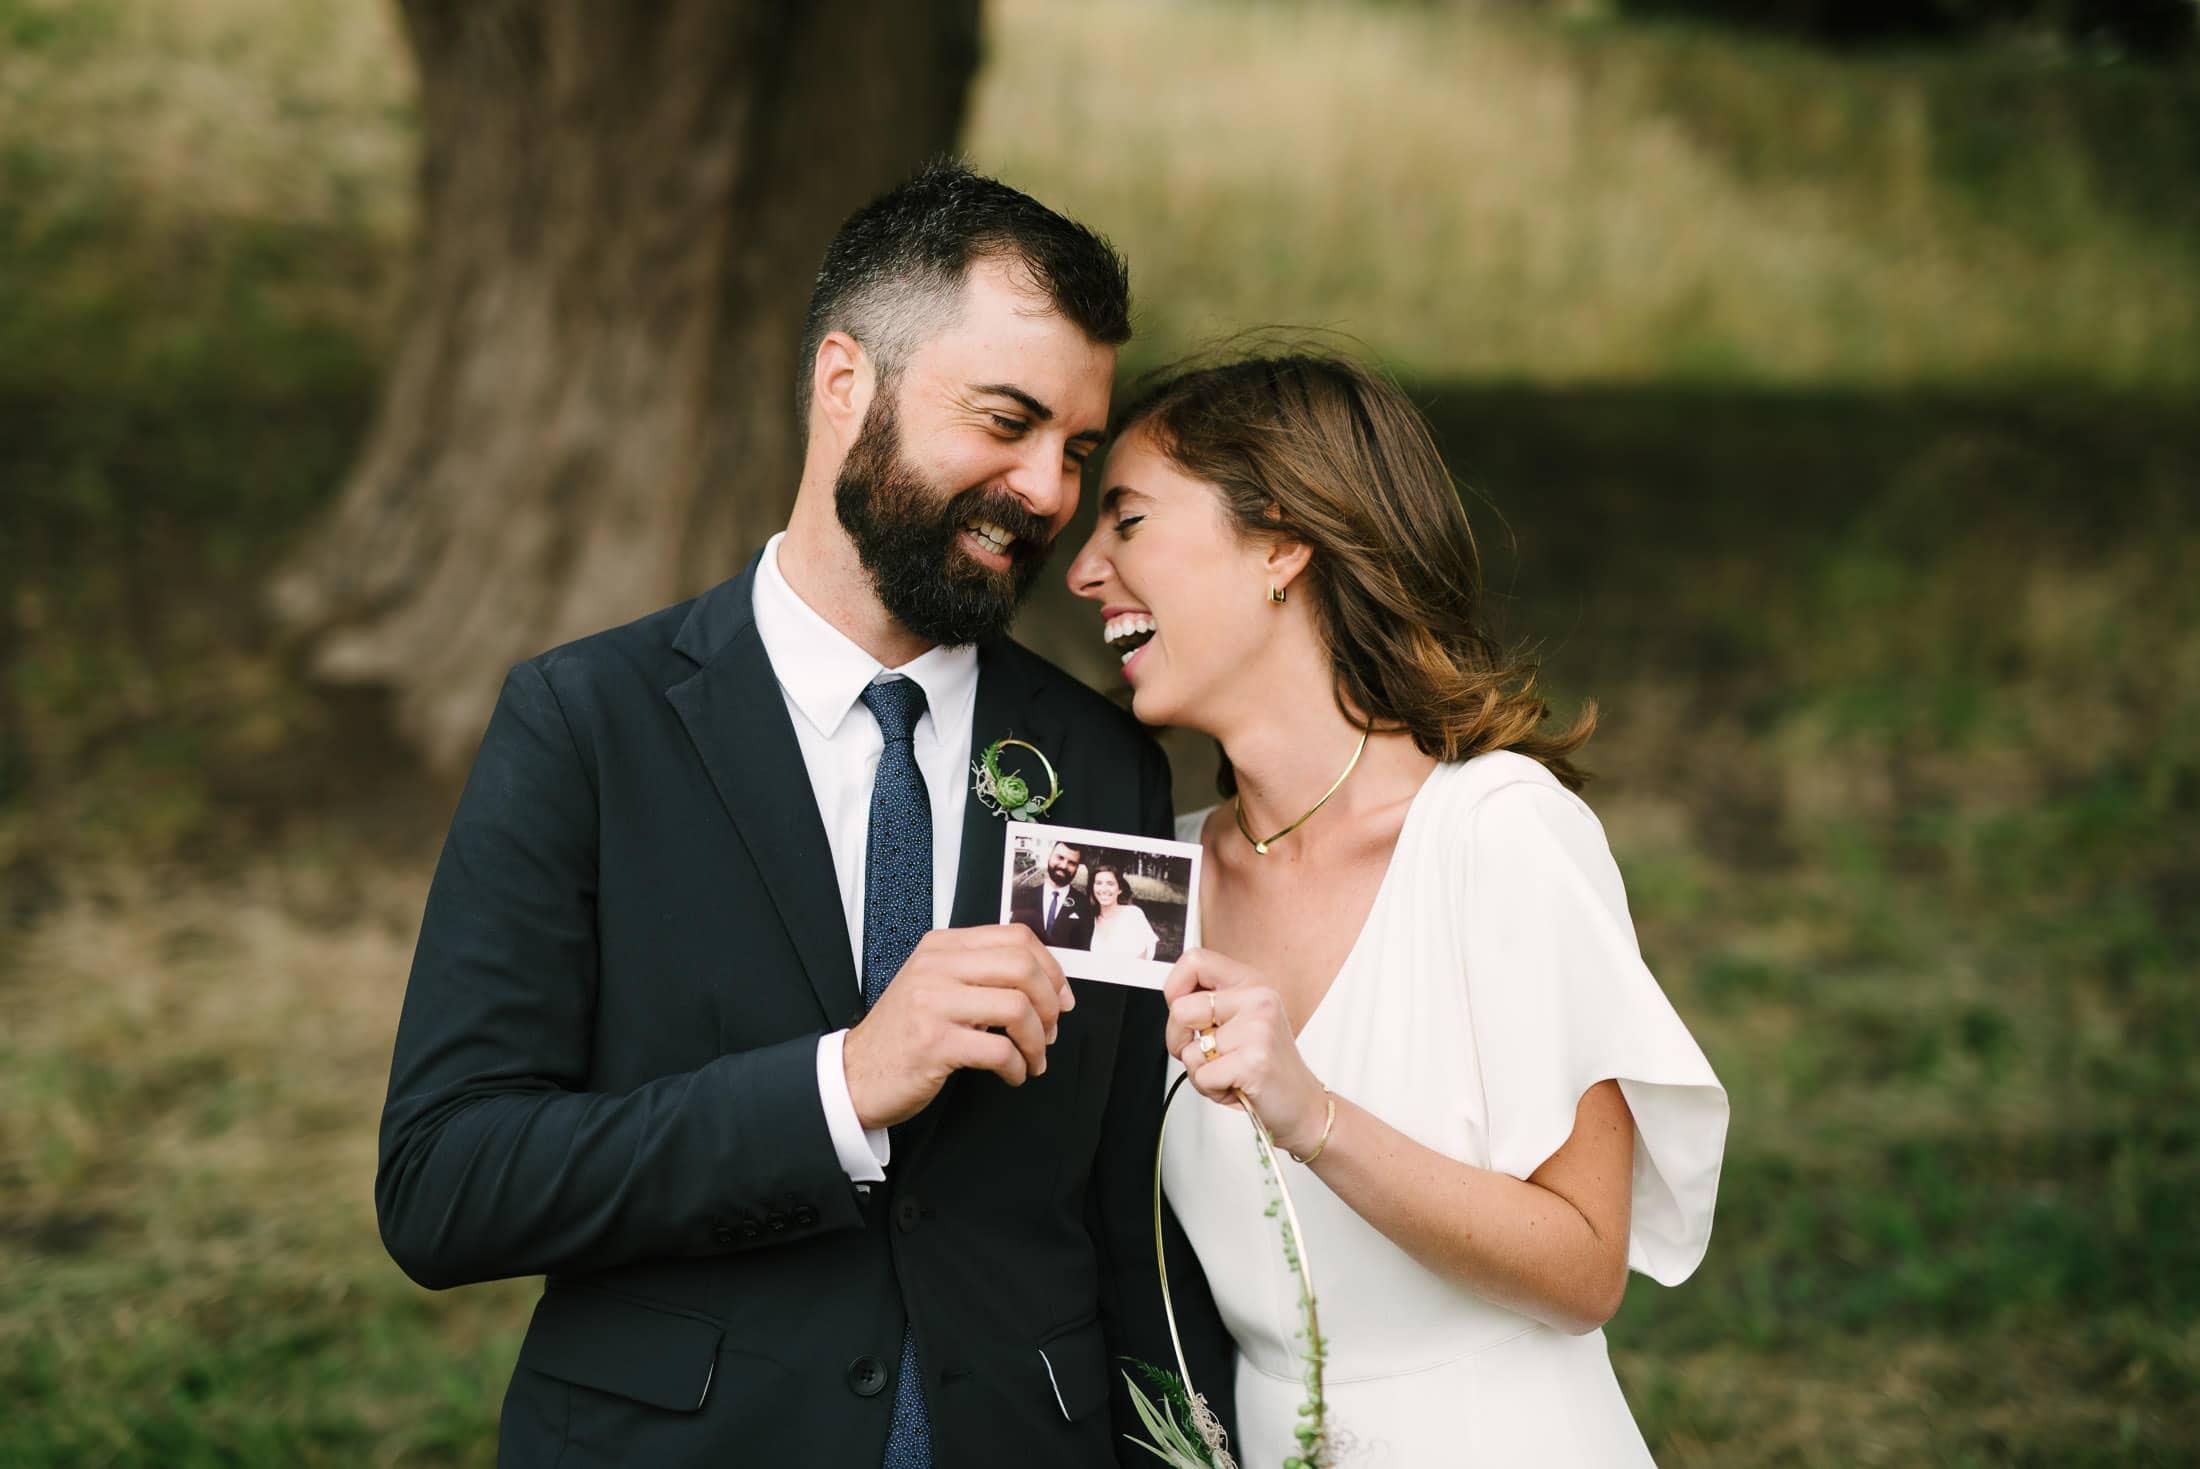 Marin Headland Wedding Portrait